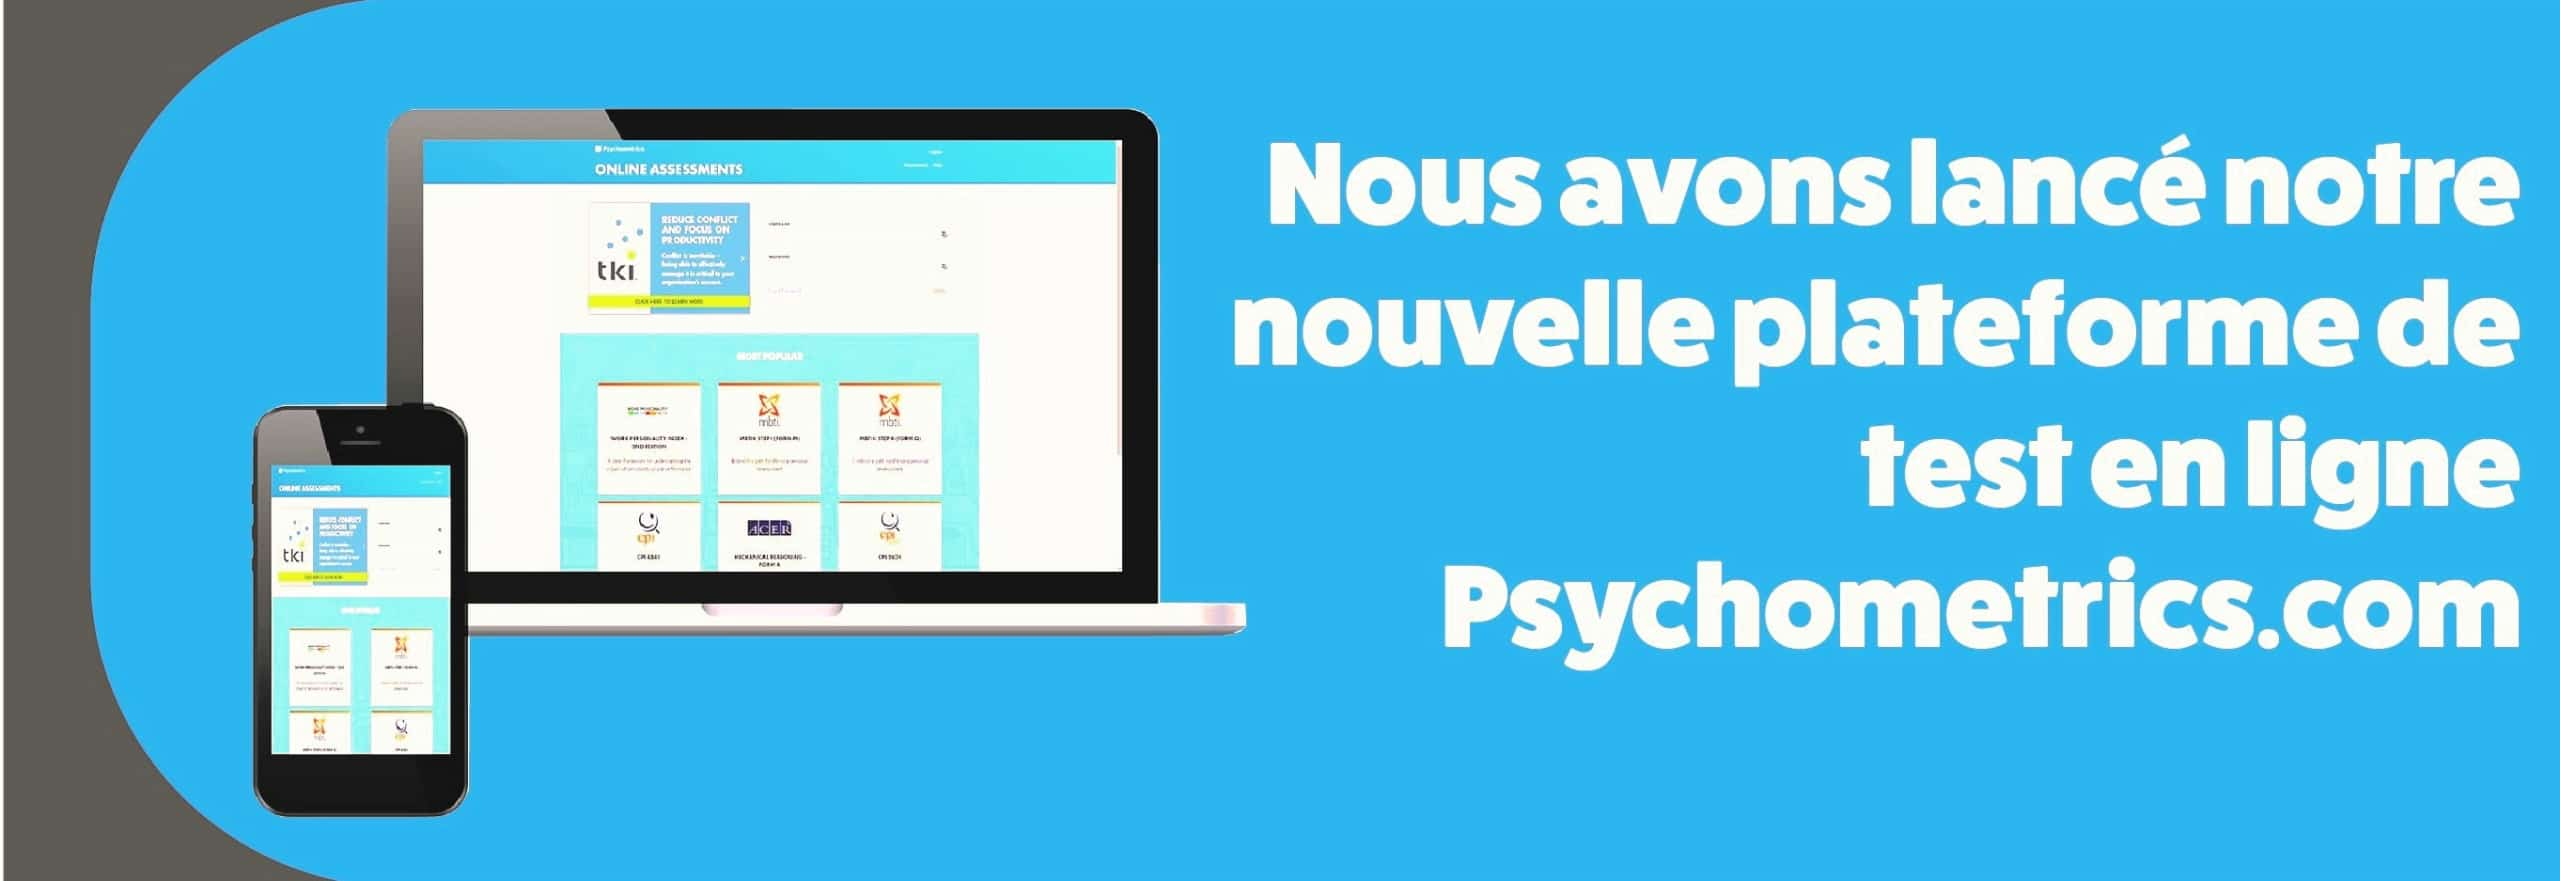 Platforme de test en ligne Psychometrics.com